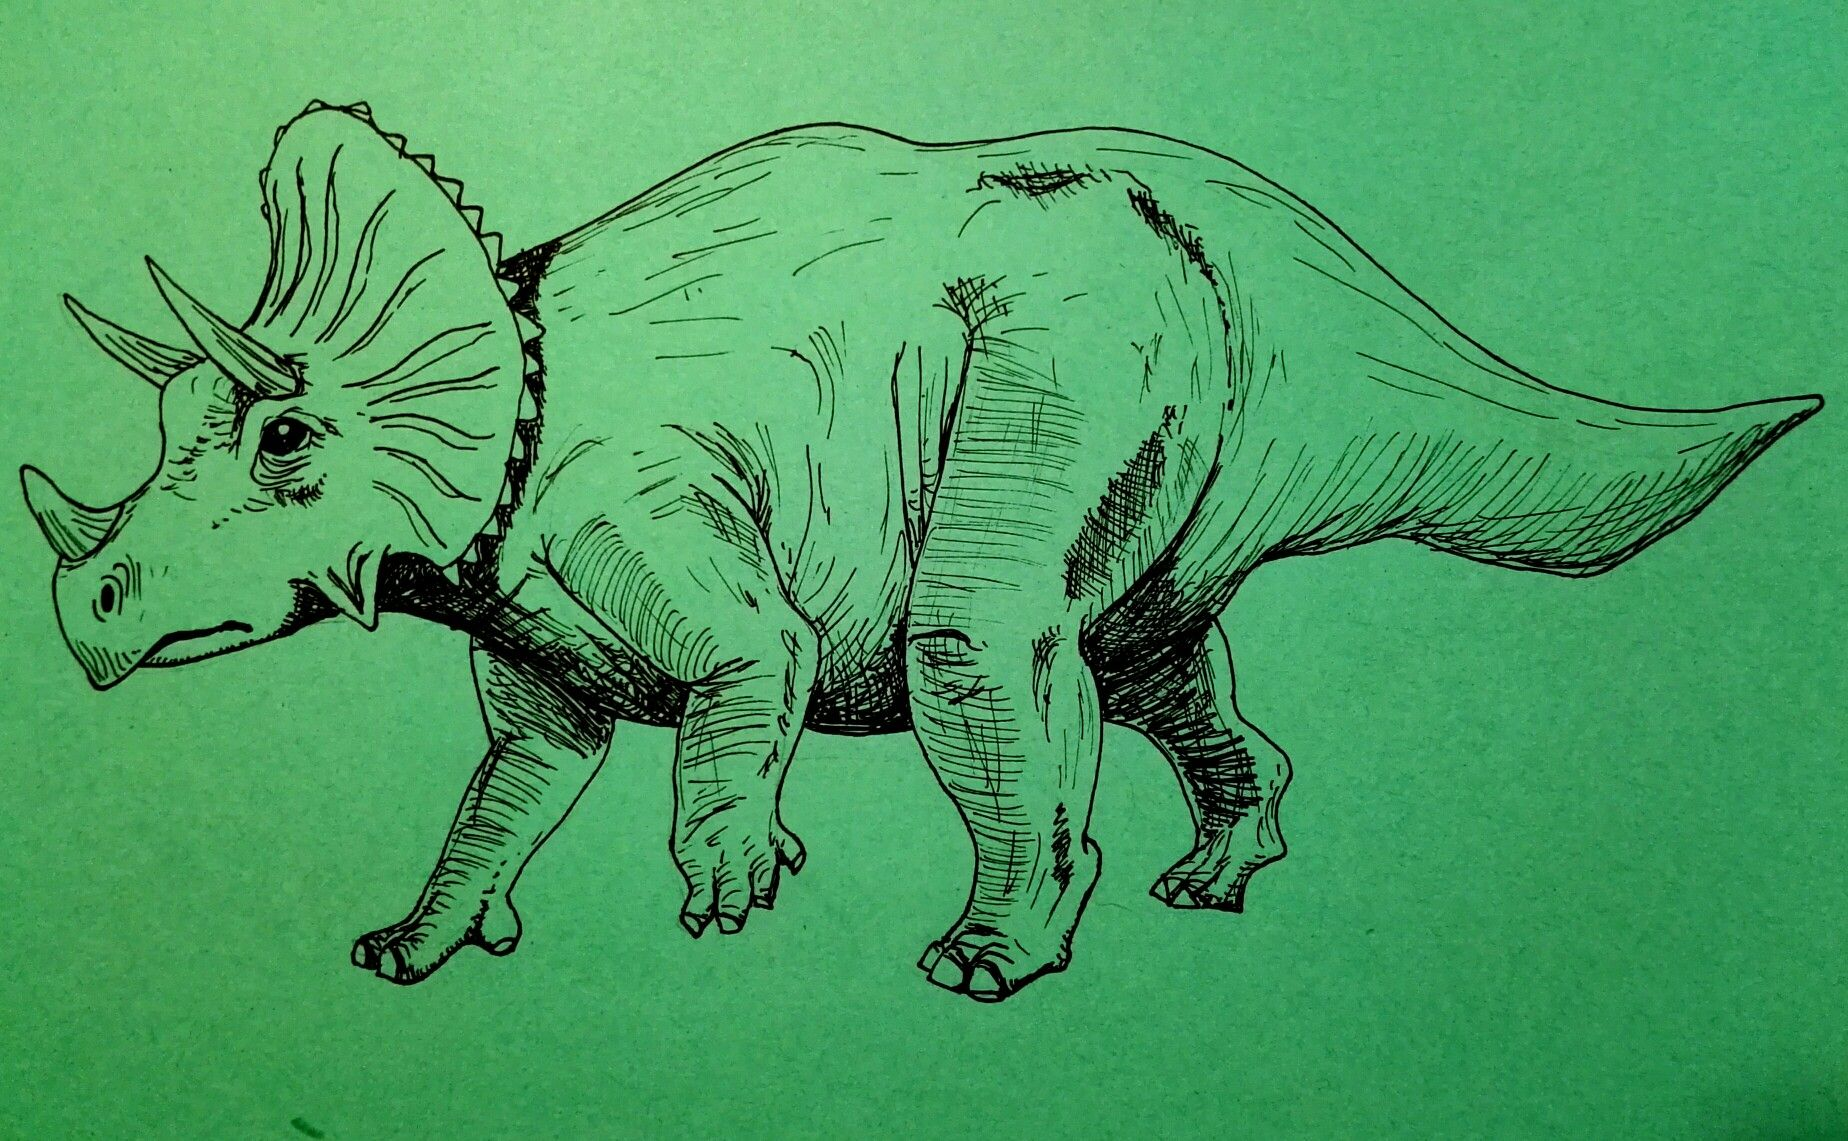 Triceratops dibujo blanco y negro b&w ILUSTRACIONES